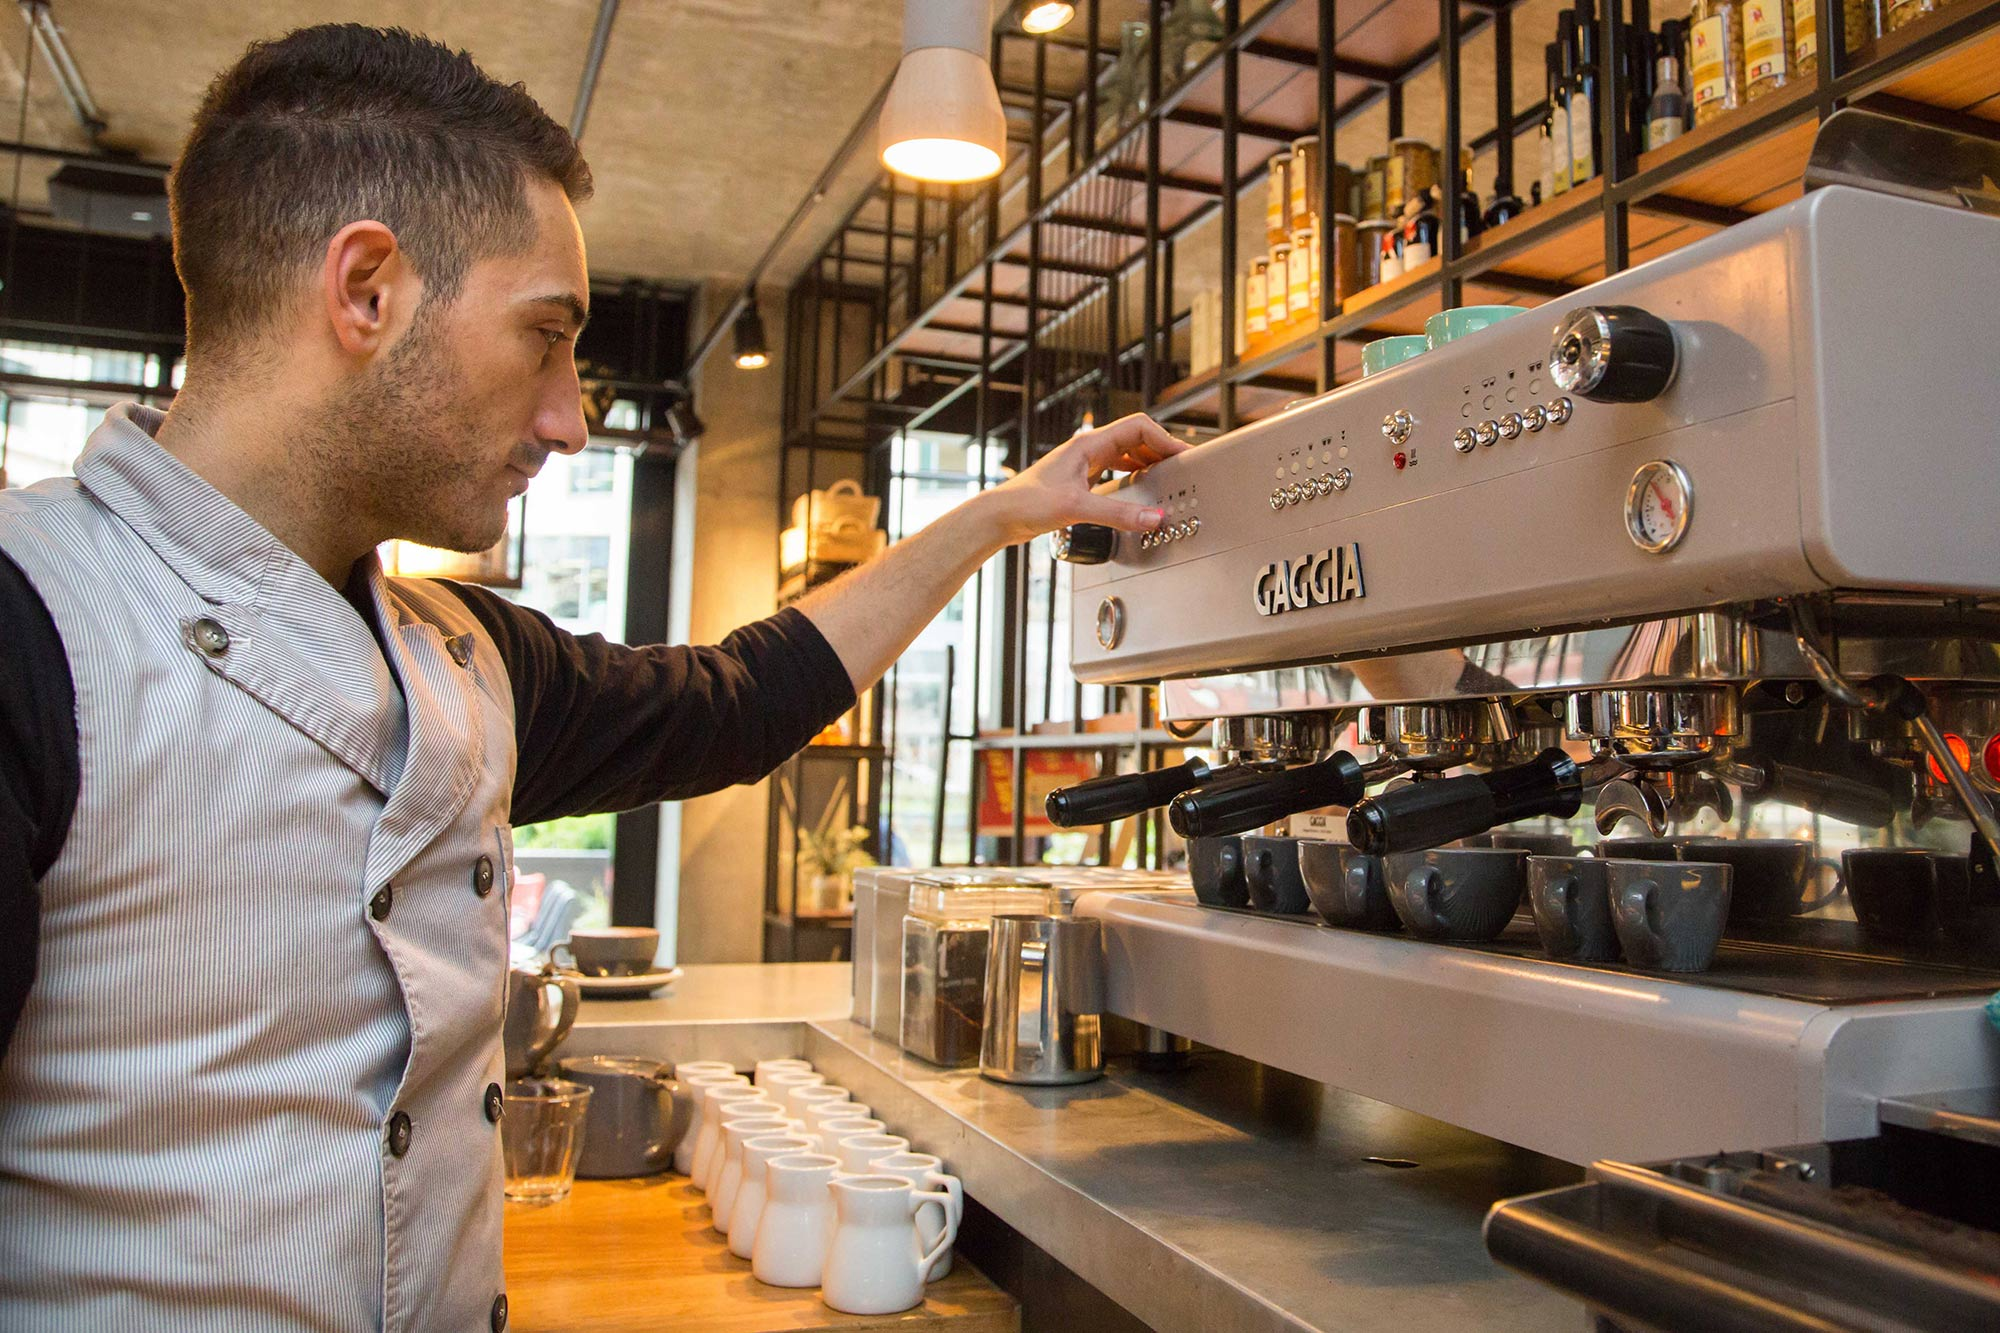 Caffeine supplies Gaggia coffee machines to Drake & Morgan